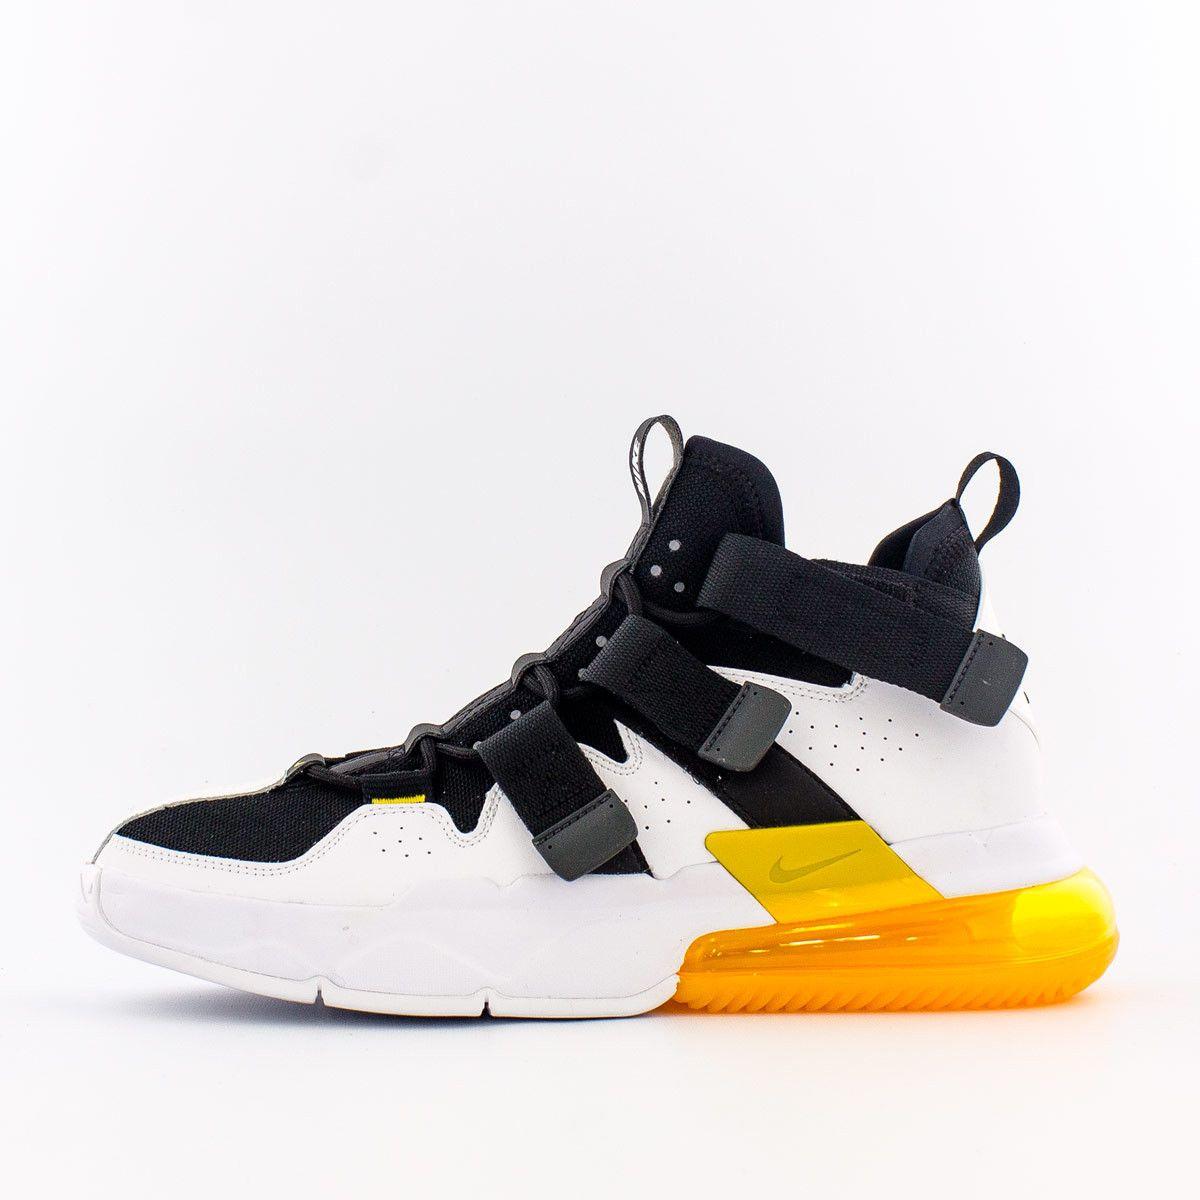 Air Edge 270 White Black Orange купить